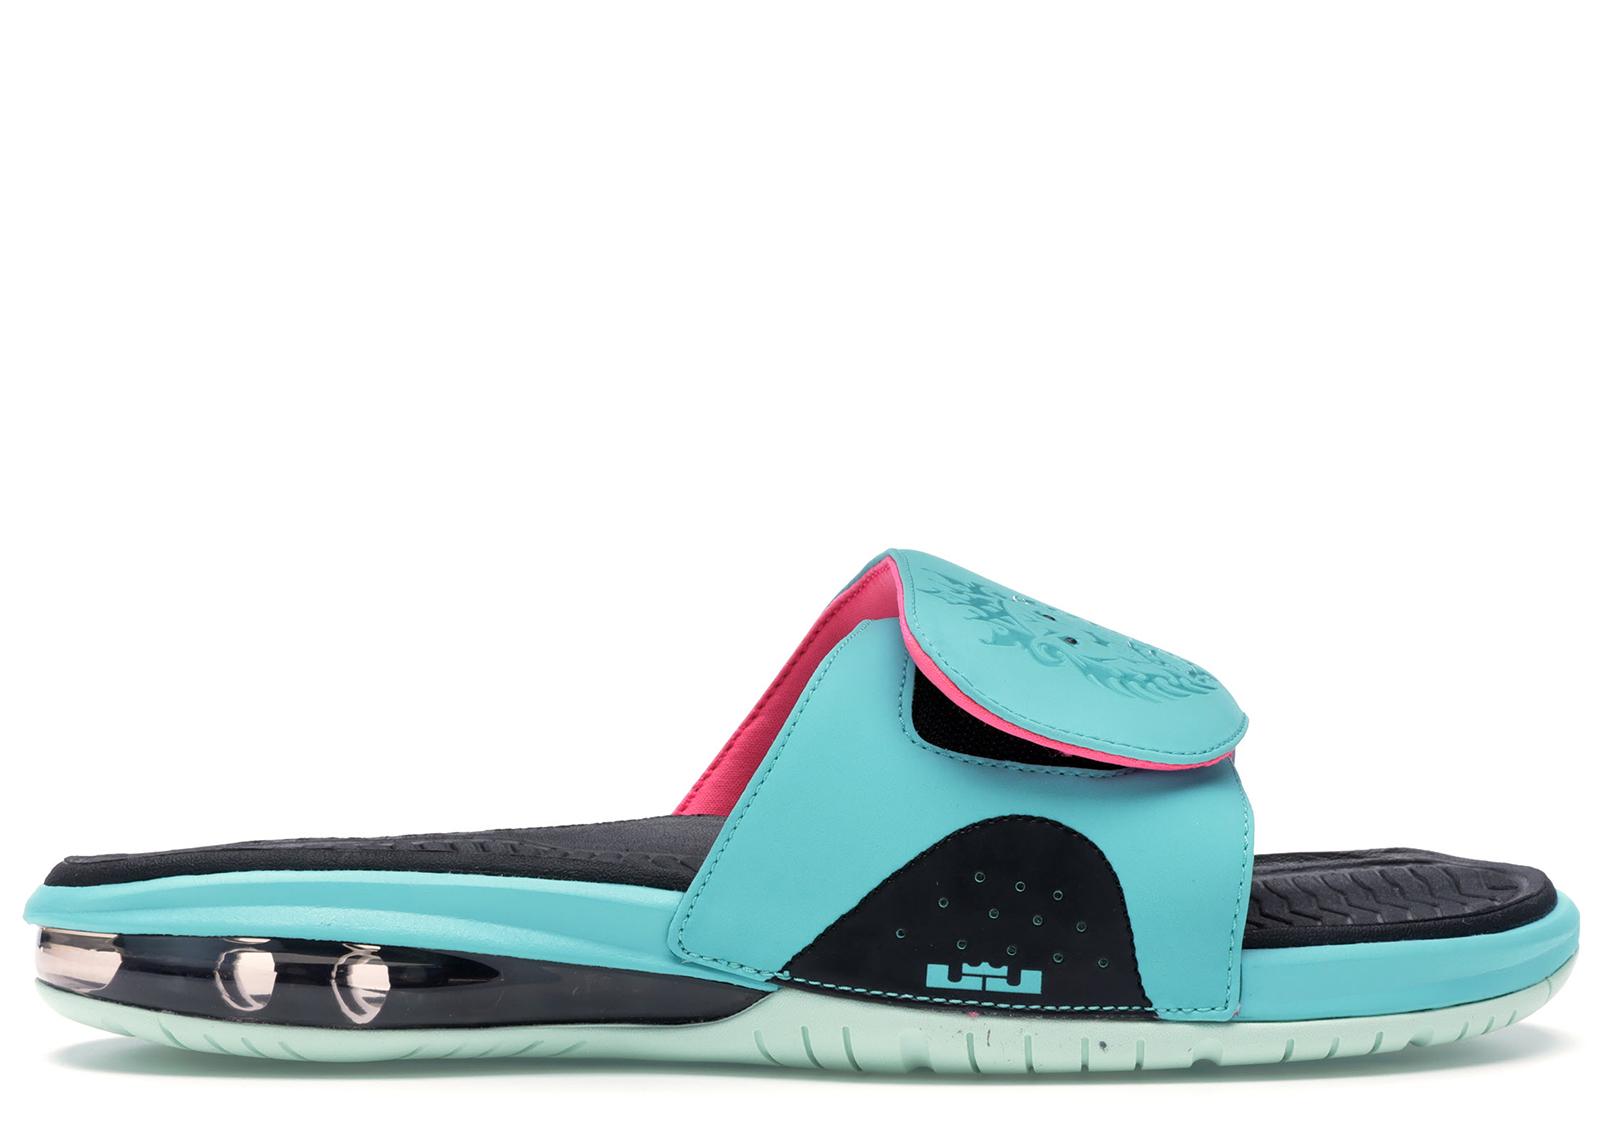 Nike LeBron Slide South Beach - 487332-400